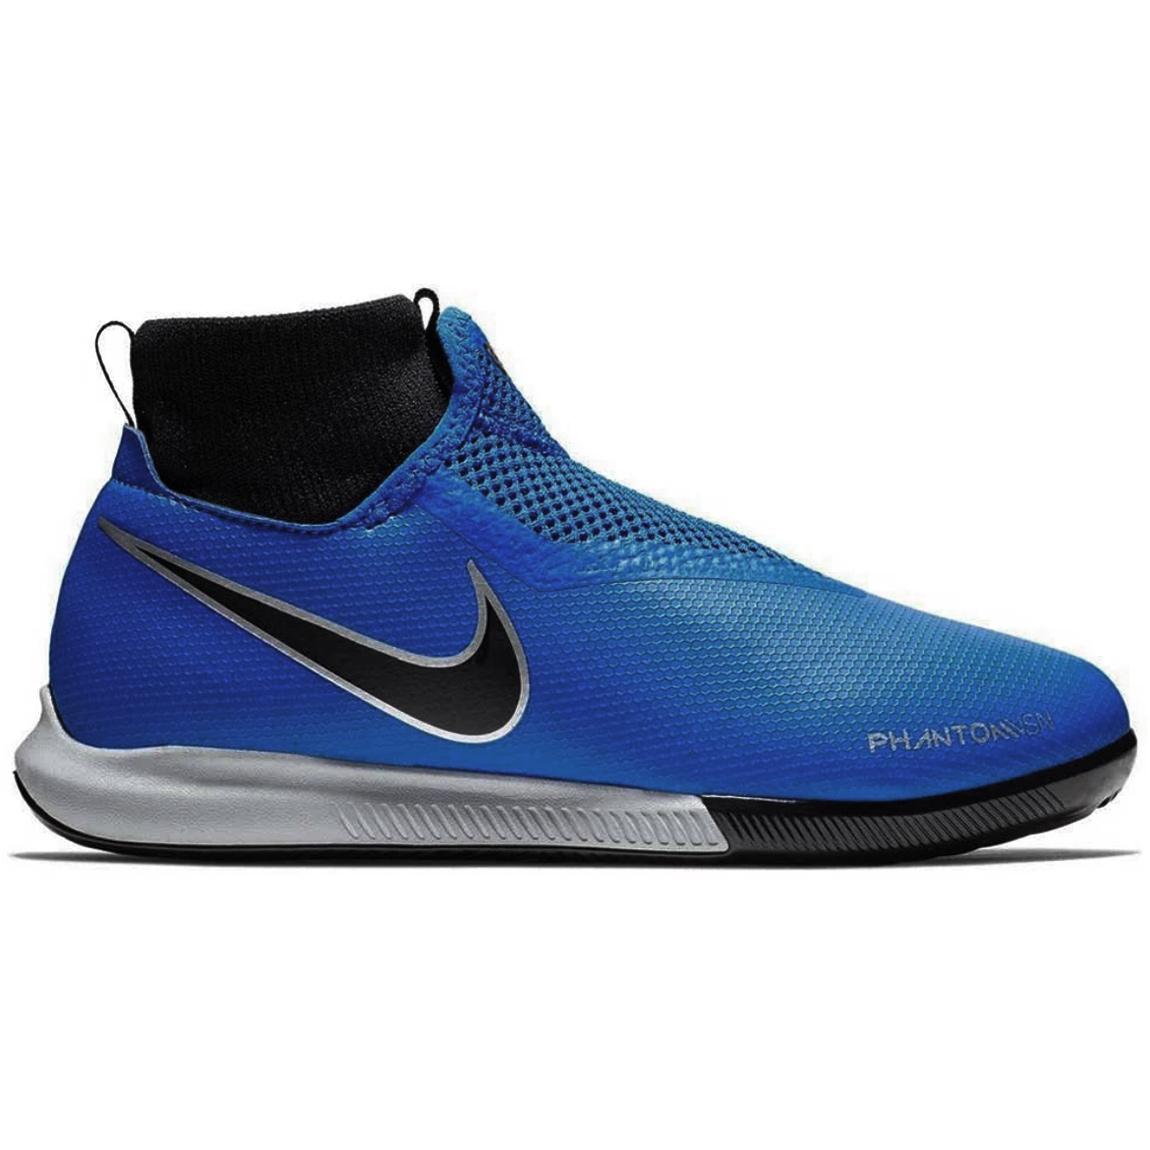 Nike JR Phantom VSN Academy DF IC Fußballschuhe blau schwarz AO3290 400